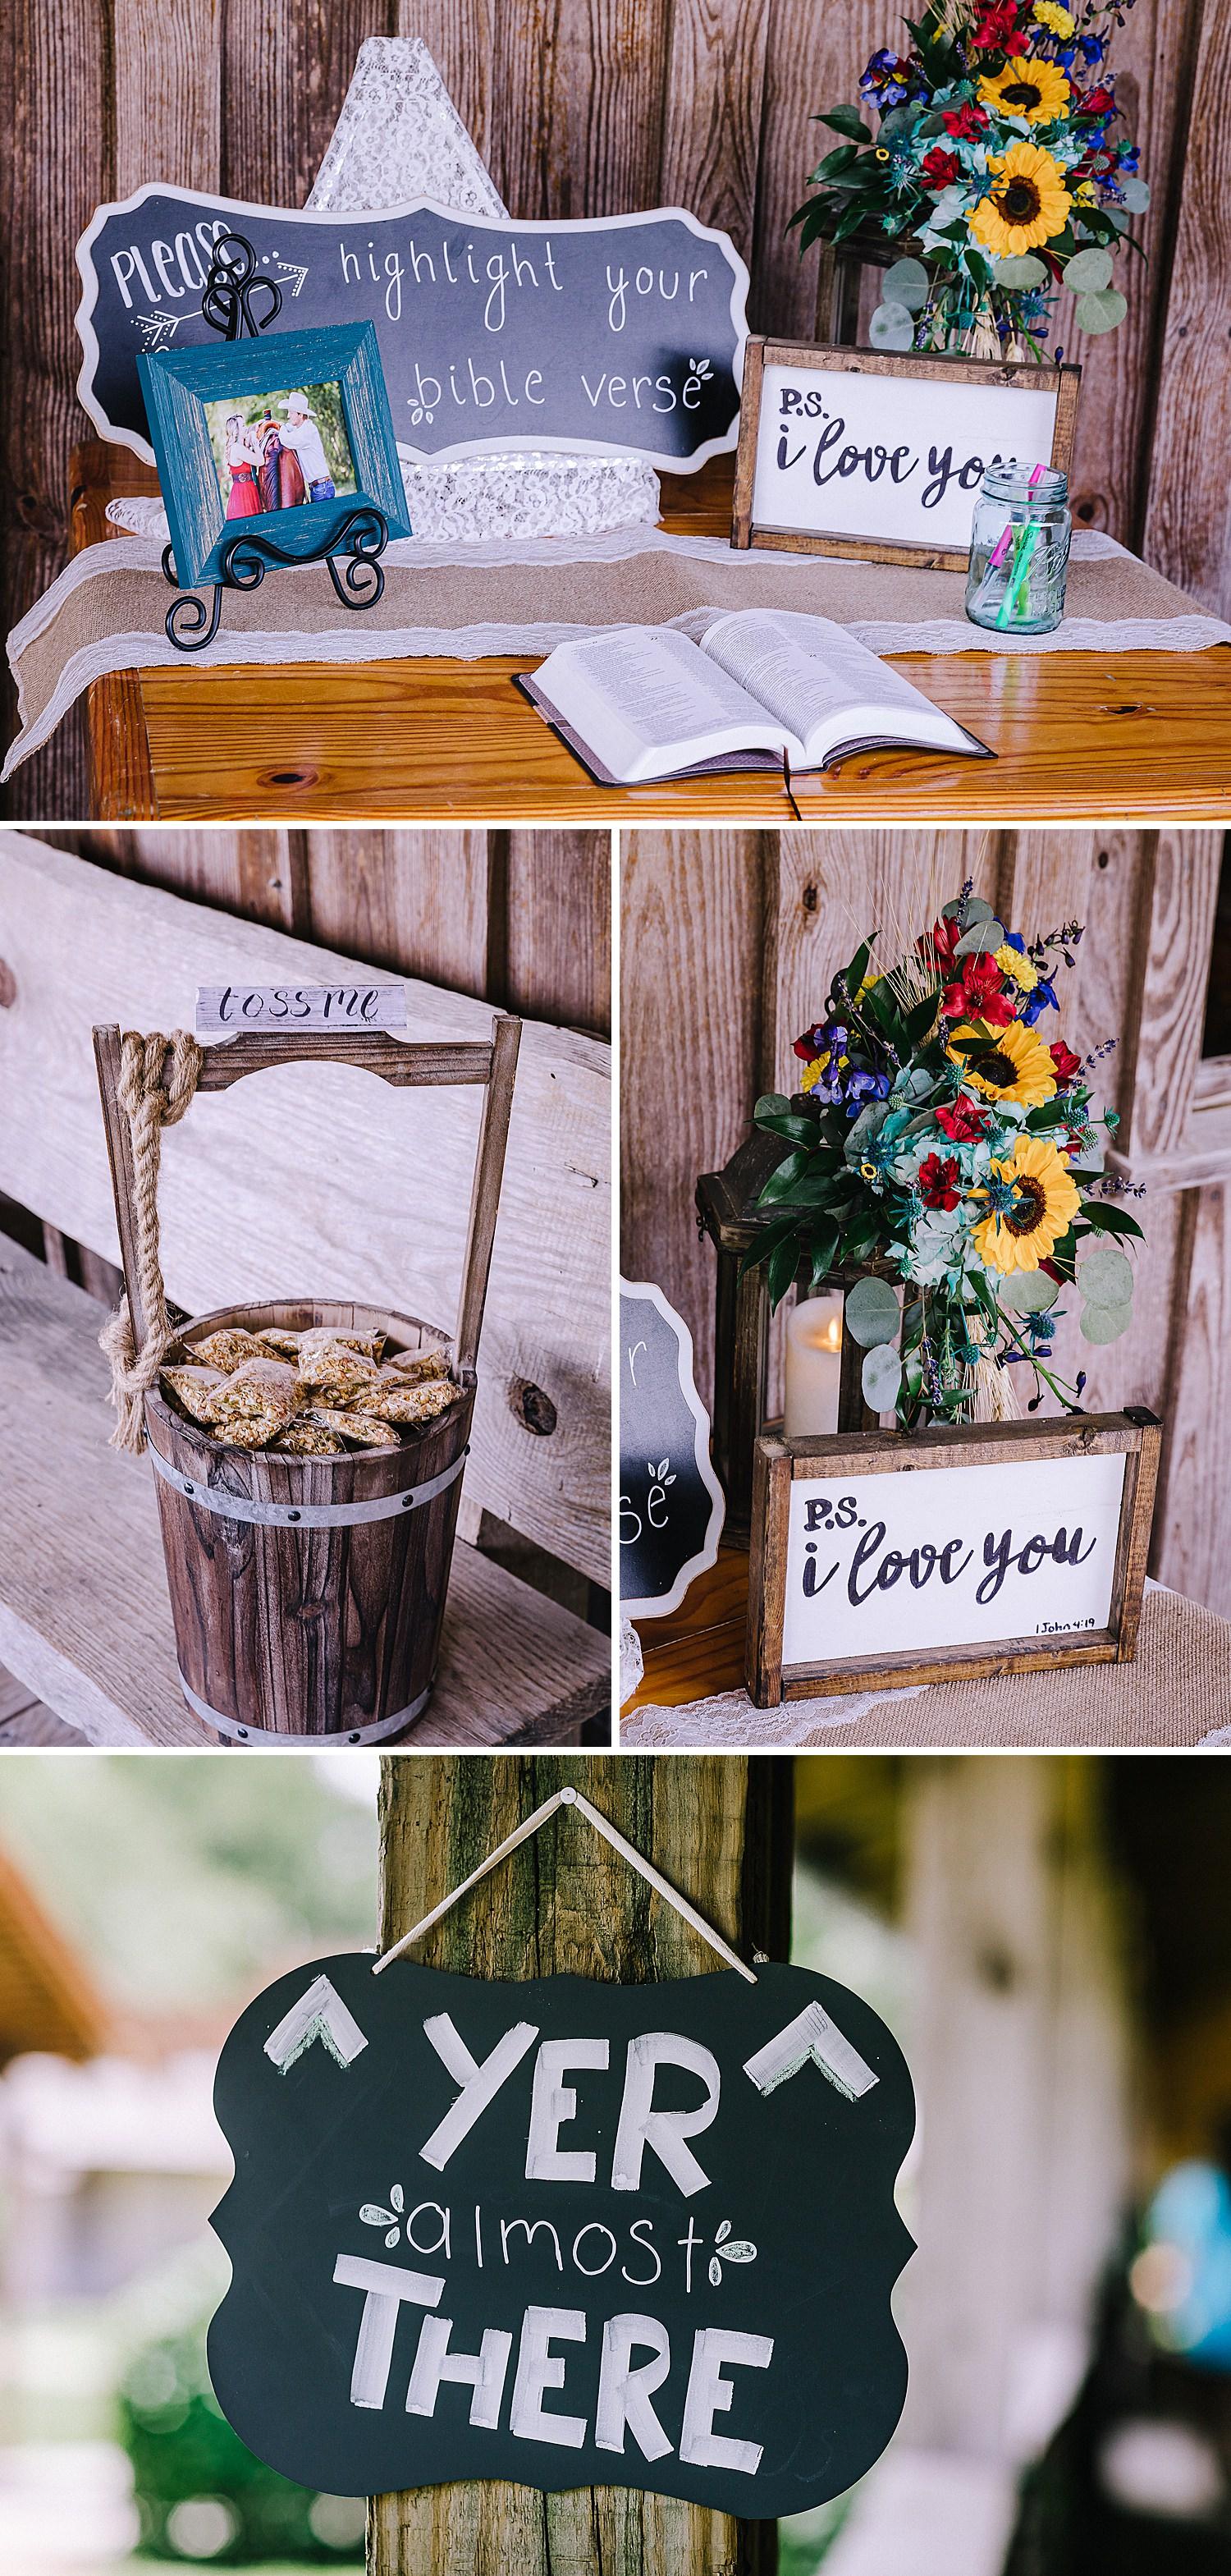 Carly-Barton-Photography-Old-Town-Texas-Rustic-Wedding-Photos-Sunflowers-Boots-Kyle-Texas_0010.jpg